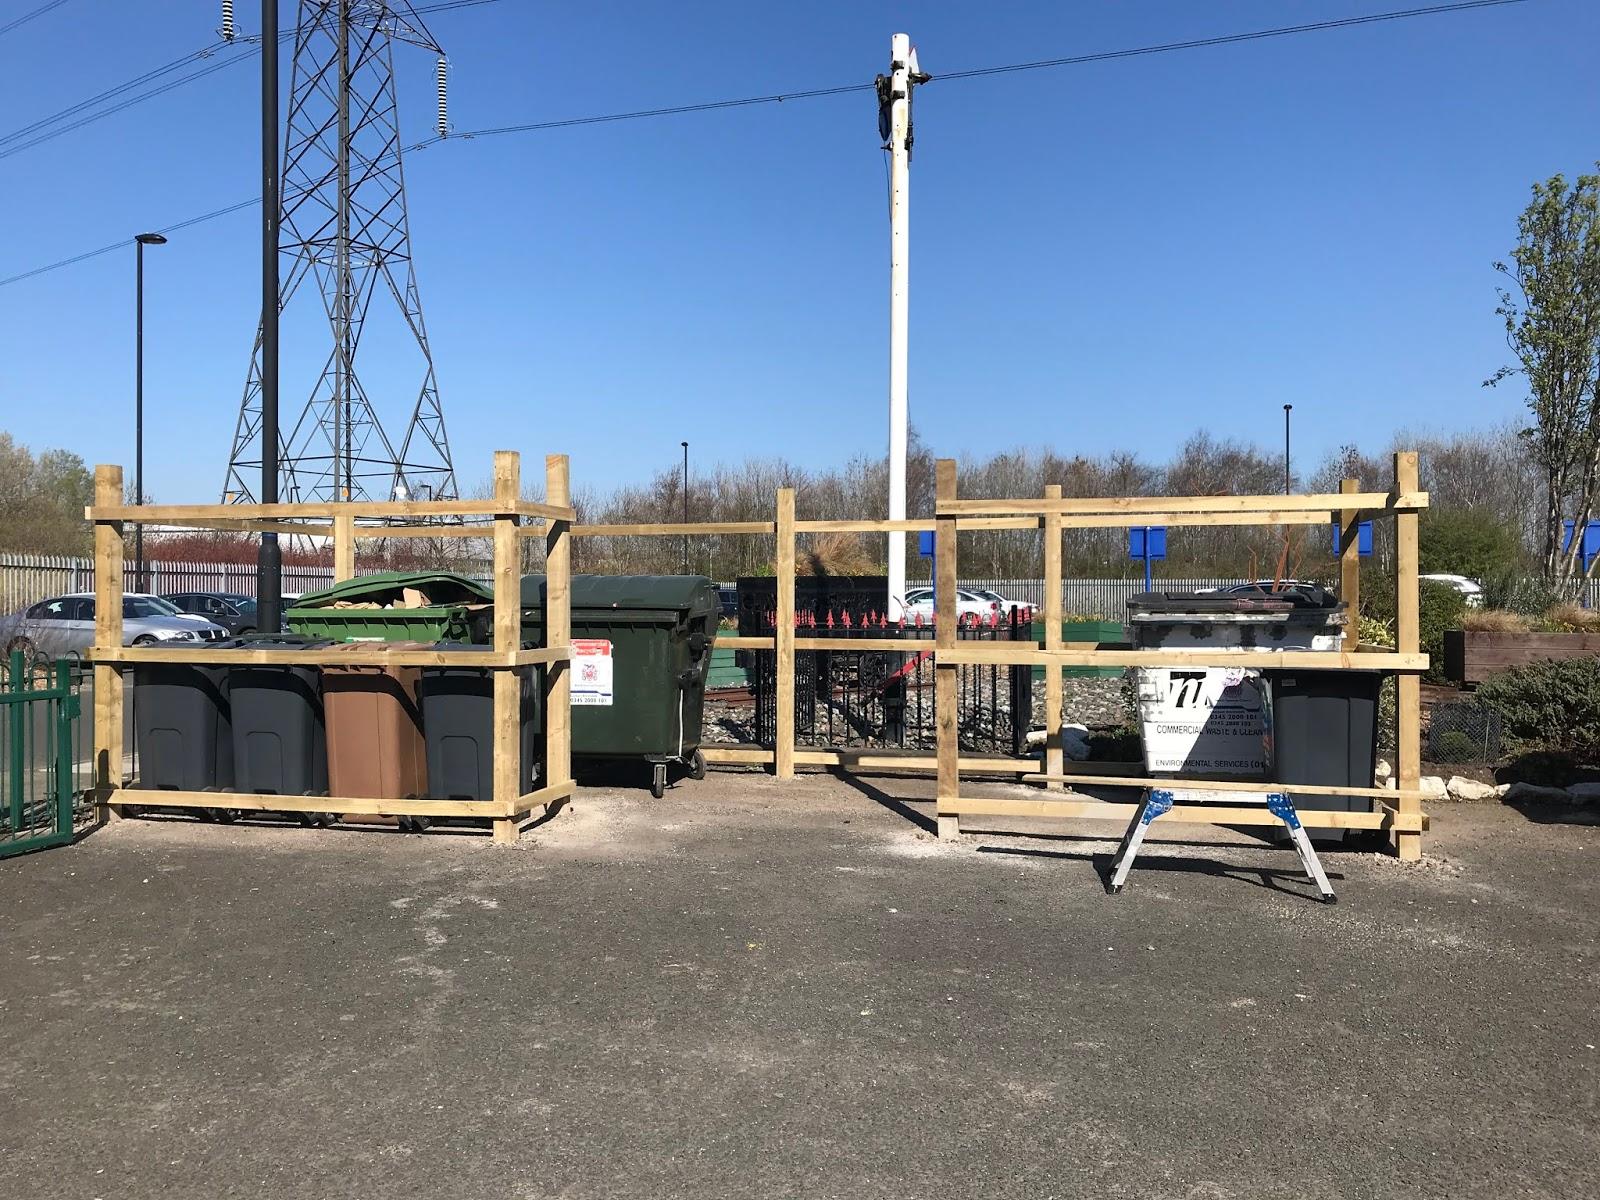 North Tyneside Steam Railway: Bin storage progress